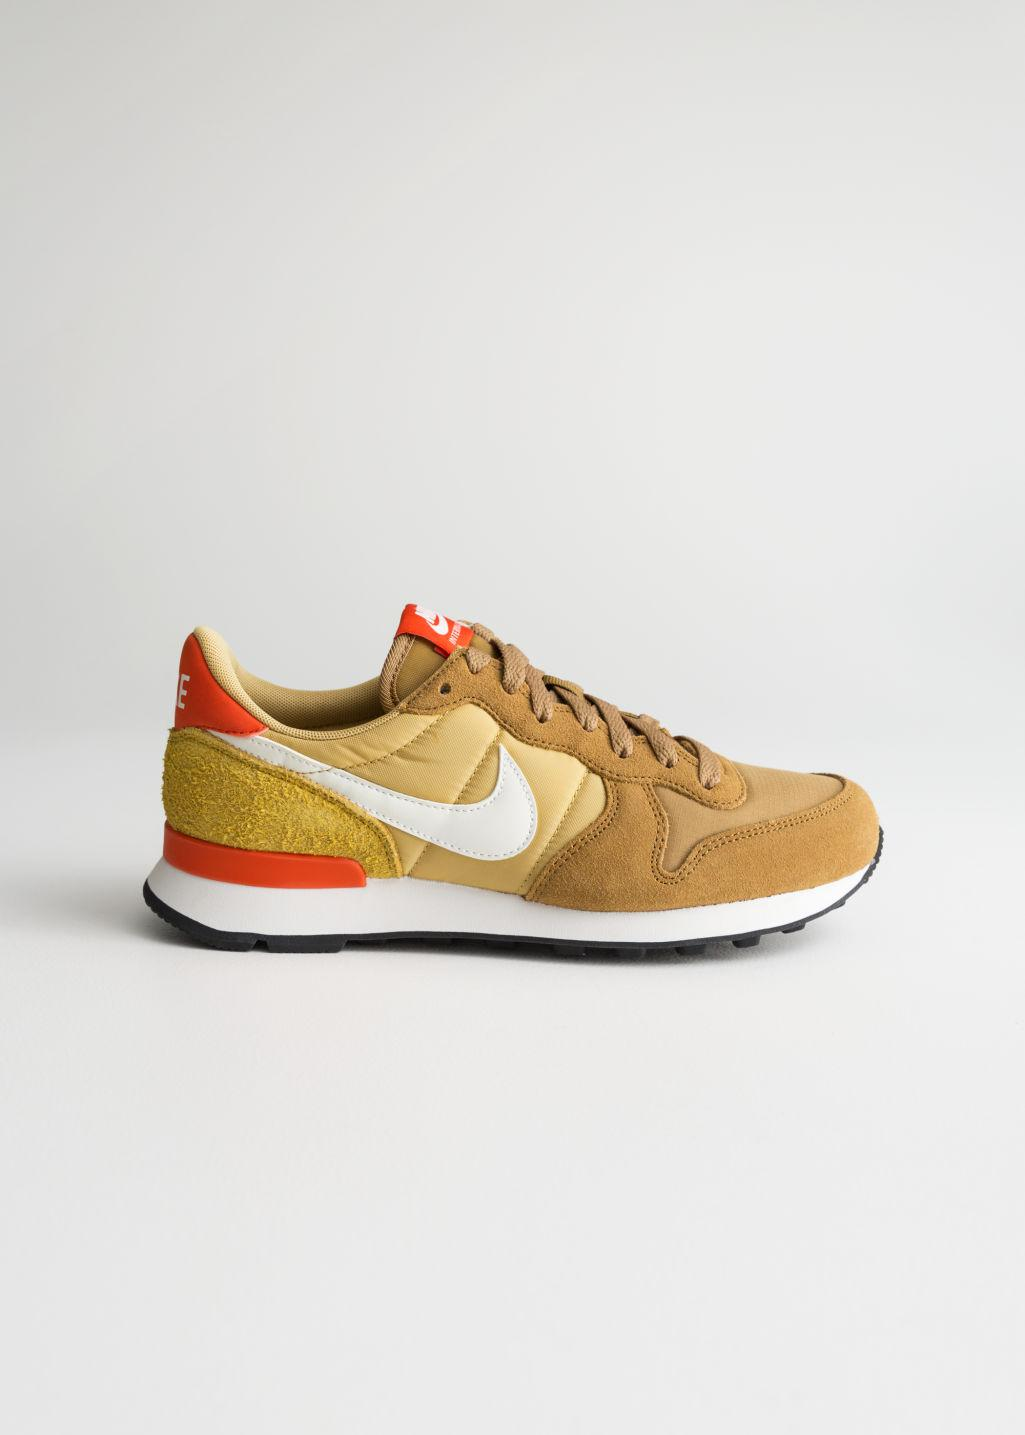 cheaper fa0b7 f6955 Other Stories. Women s Orange Nike Internationalist